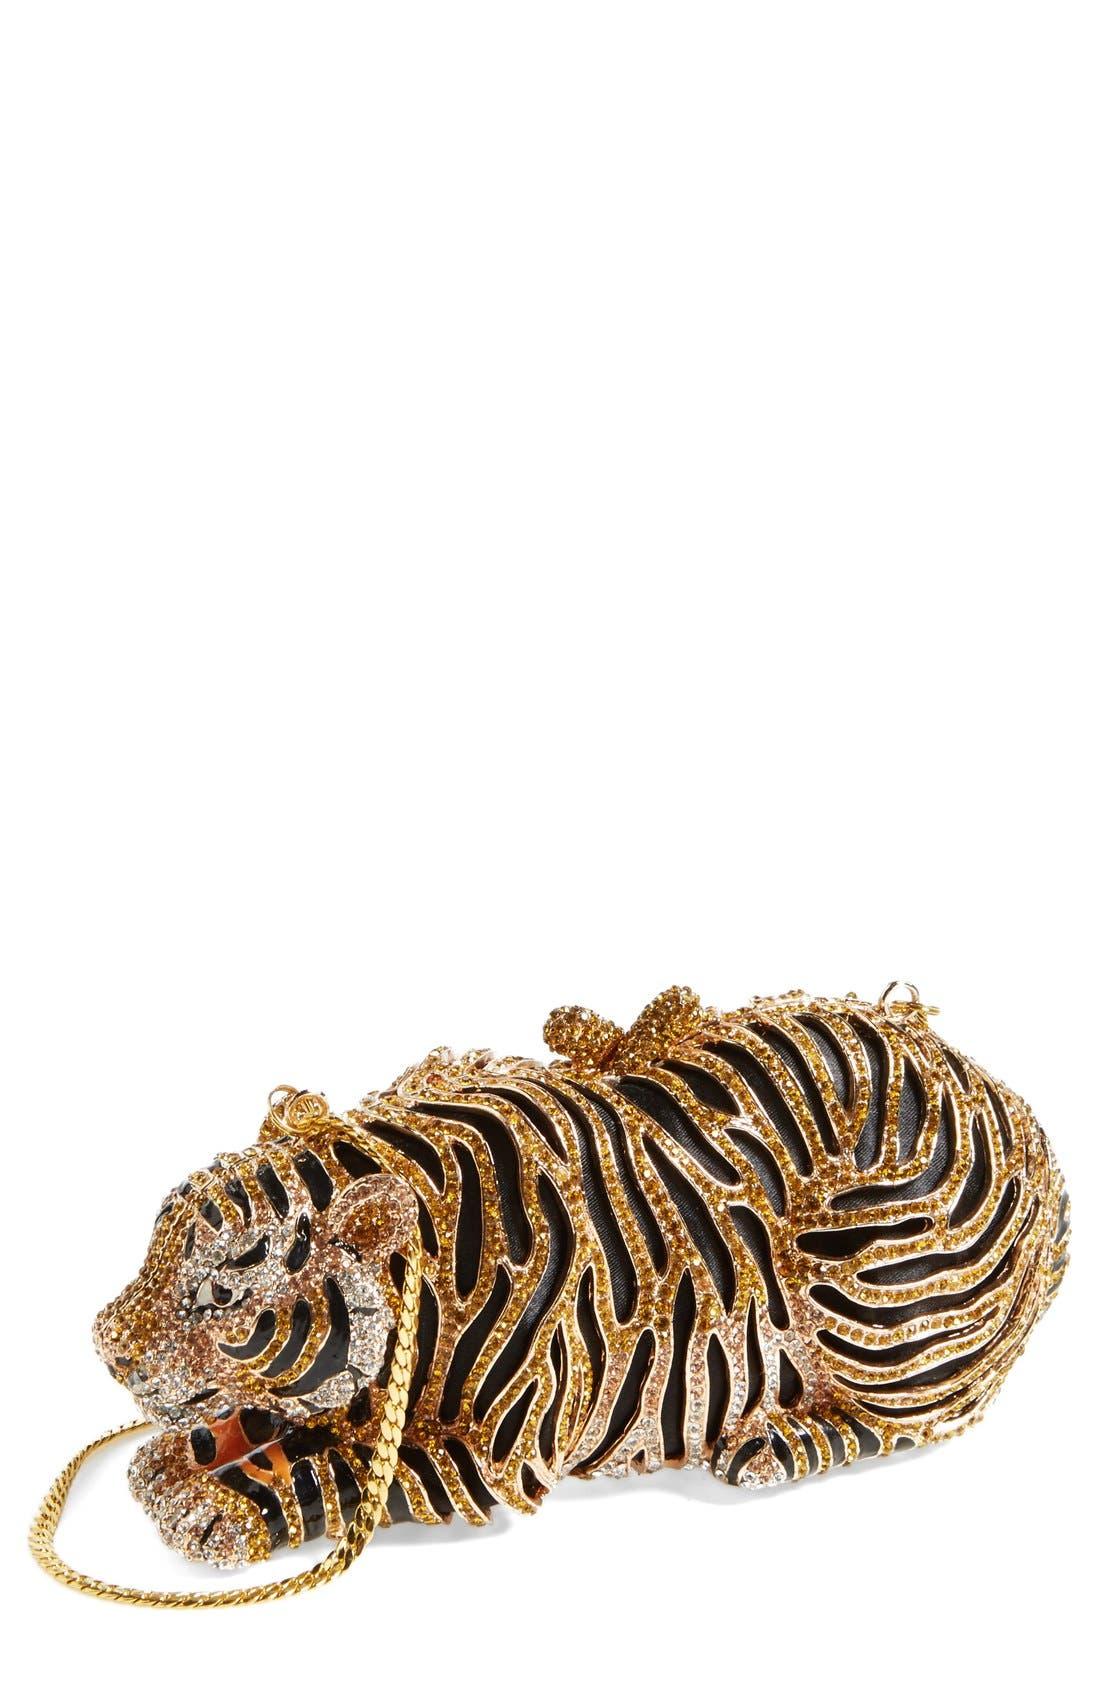 Alternate Image 1 Selected - Natasha Couture Tiger Minaudiere